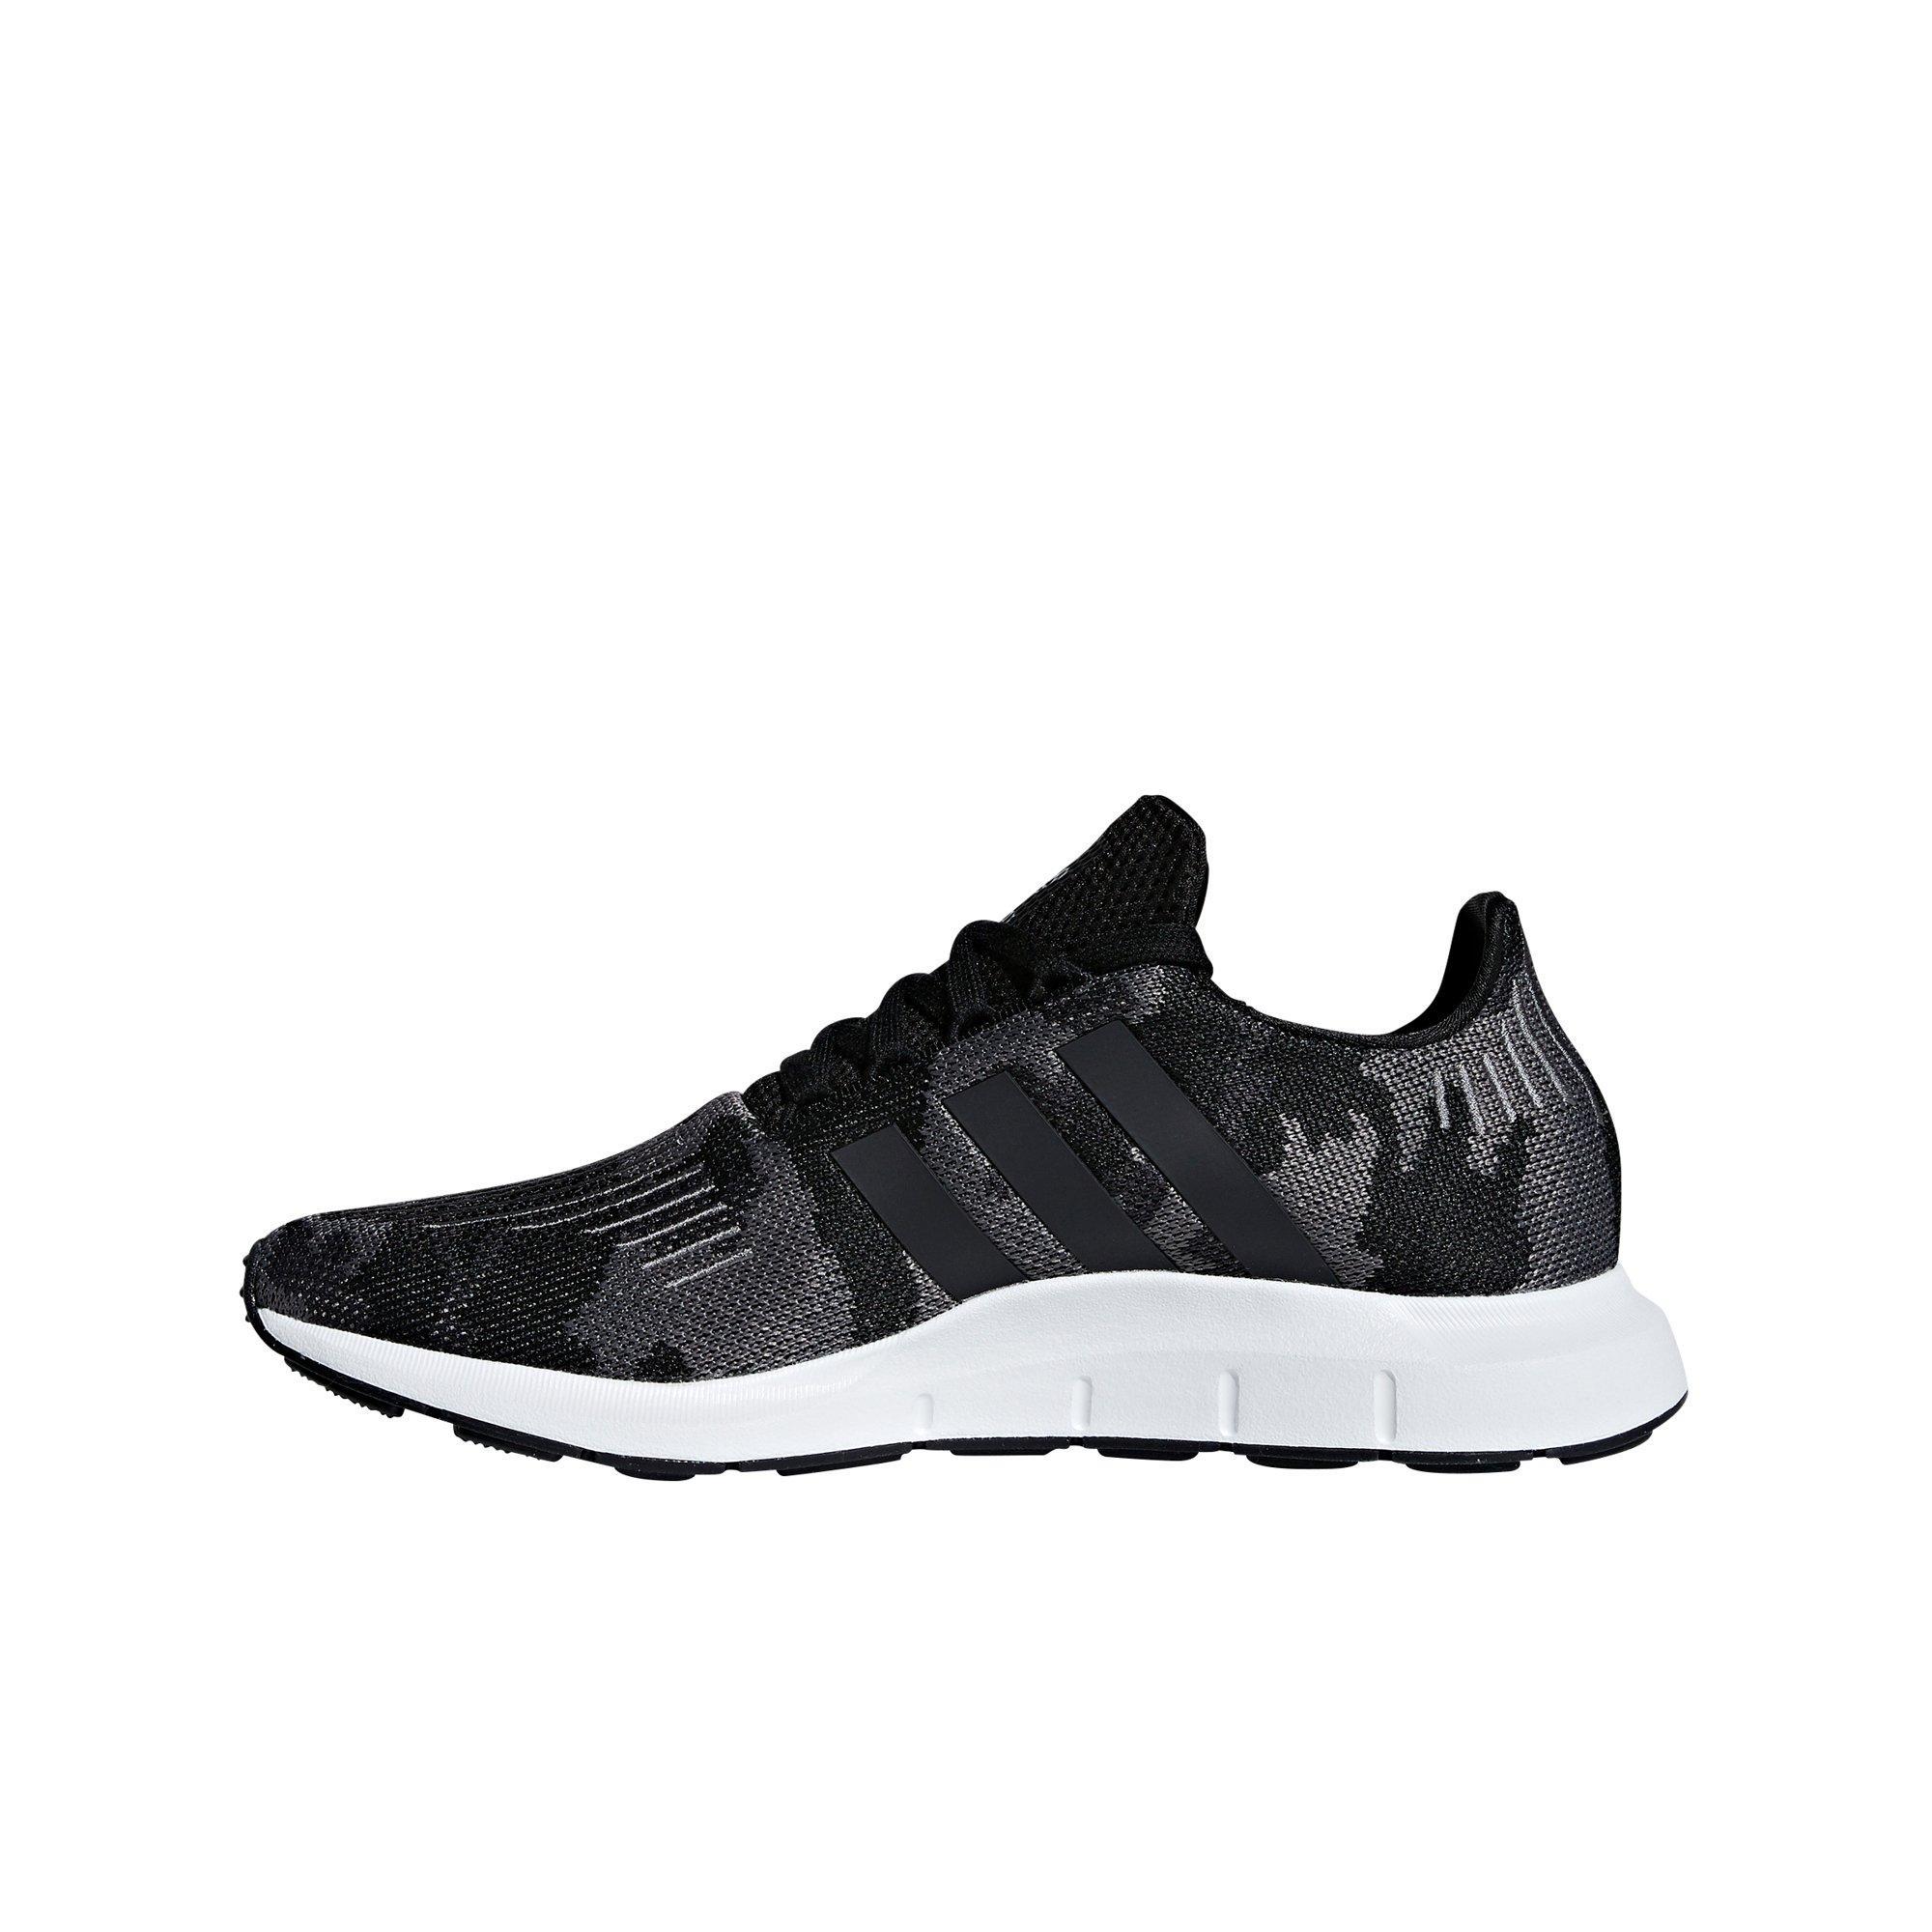 1a27471e1cc54 Top 10 Punto Medio Noticias | Adidas Swift Run Core Black And White